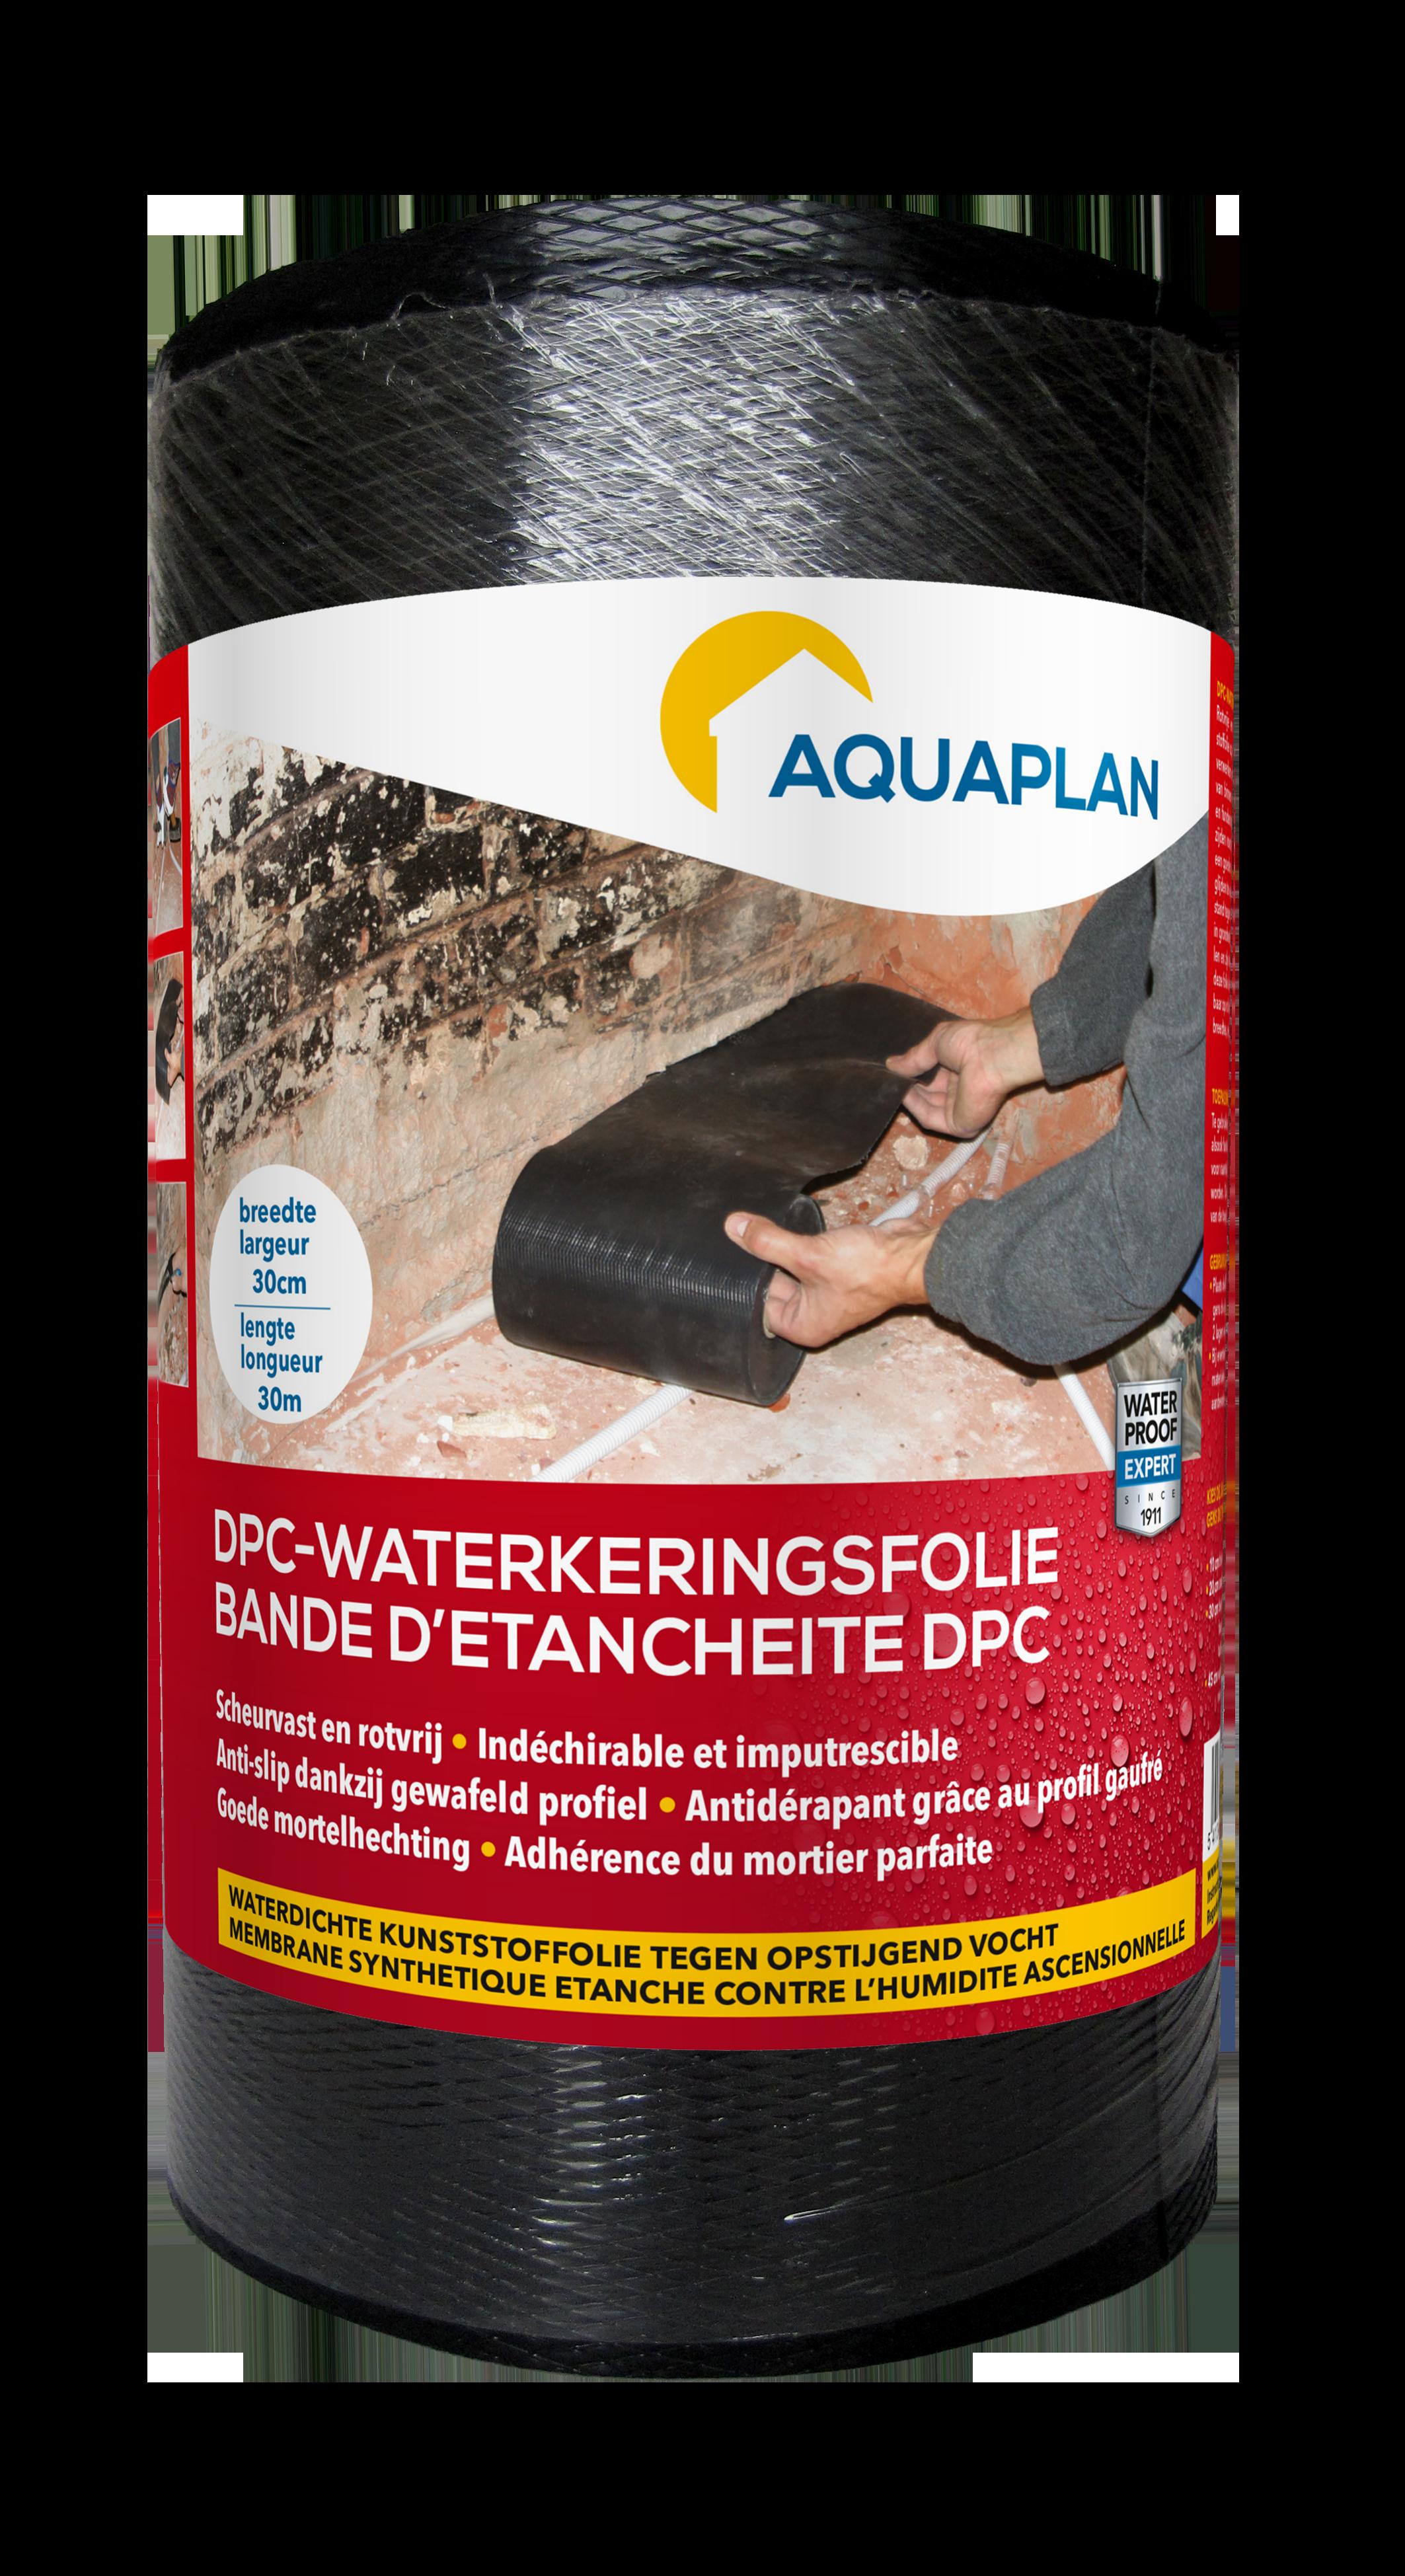 Aquaplan   DPC-Waterkeringsfolie   30 cm